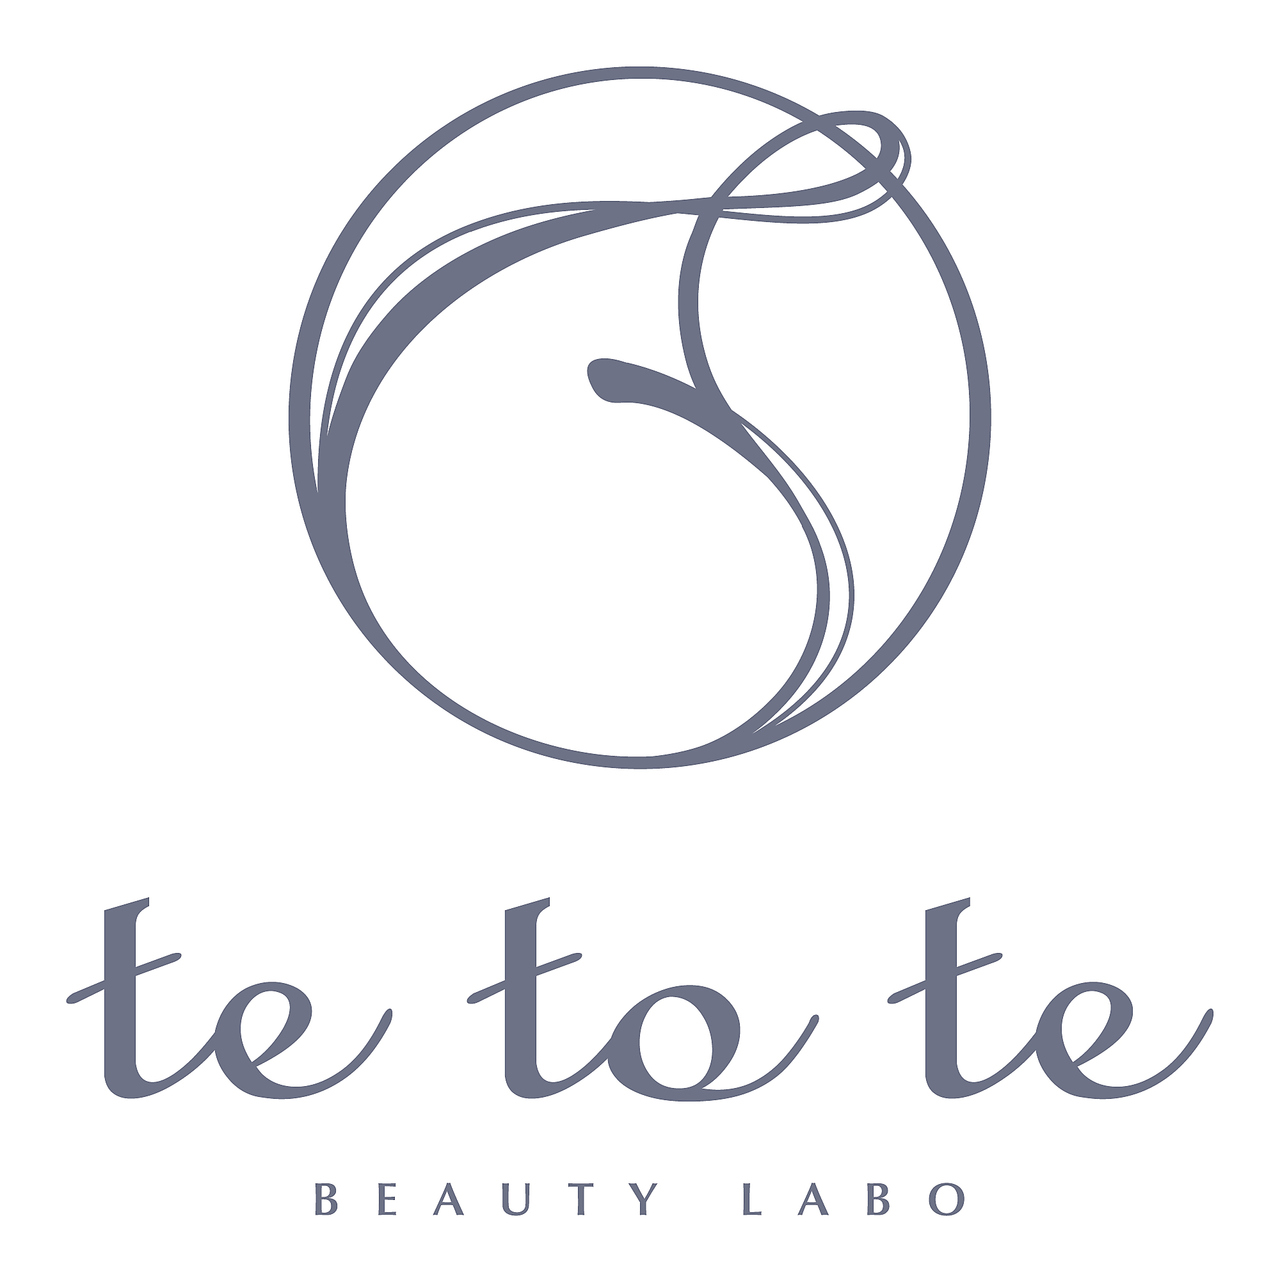 Tetote beautylabo